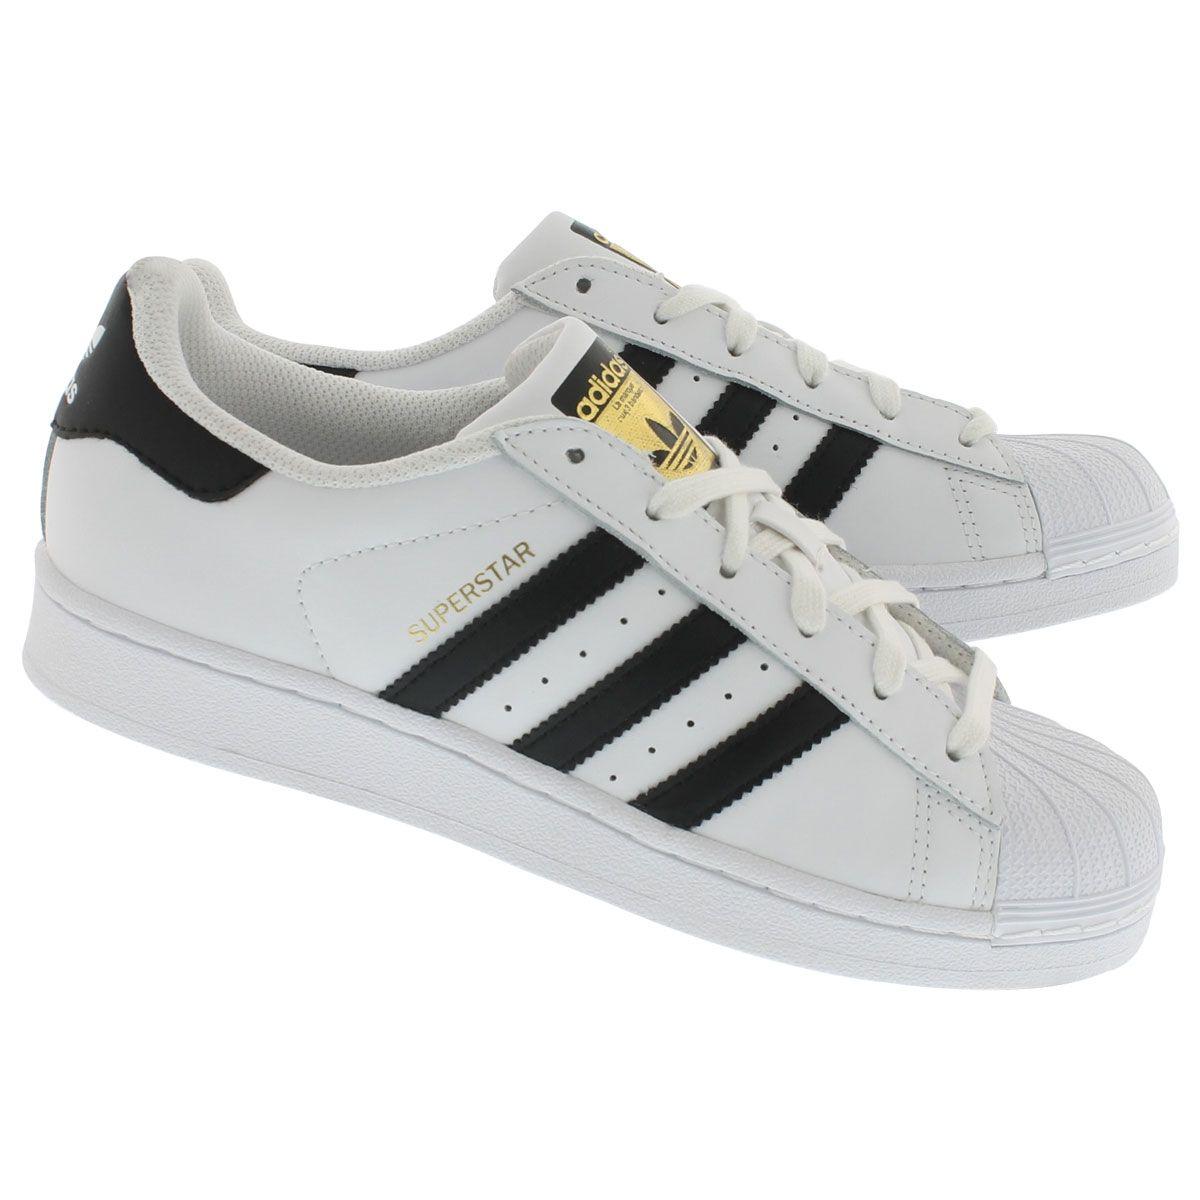 adidas women's superstar fashion sneakers c77153